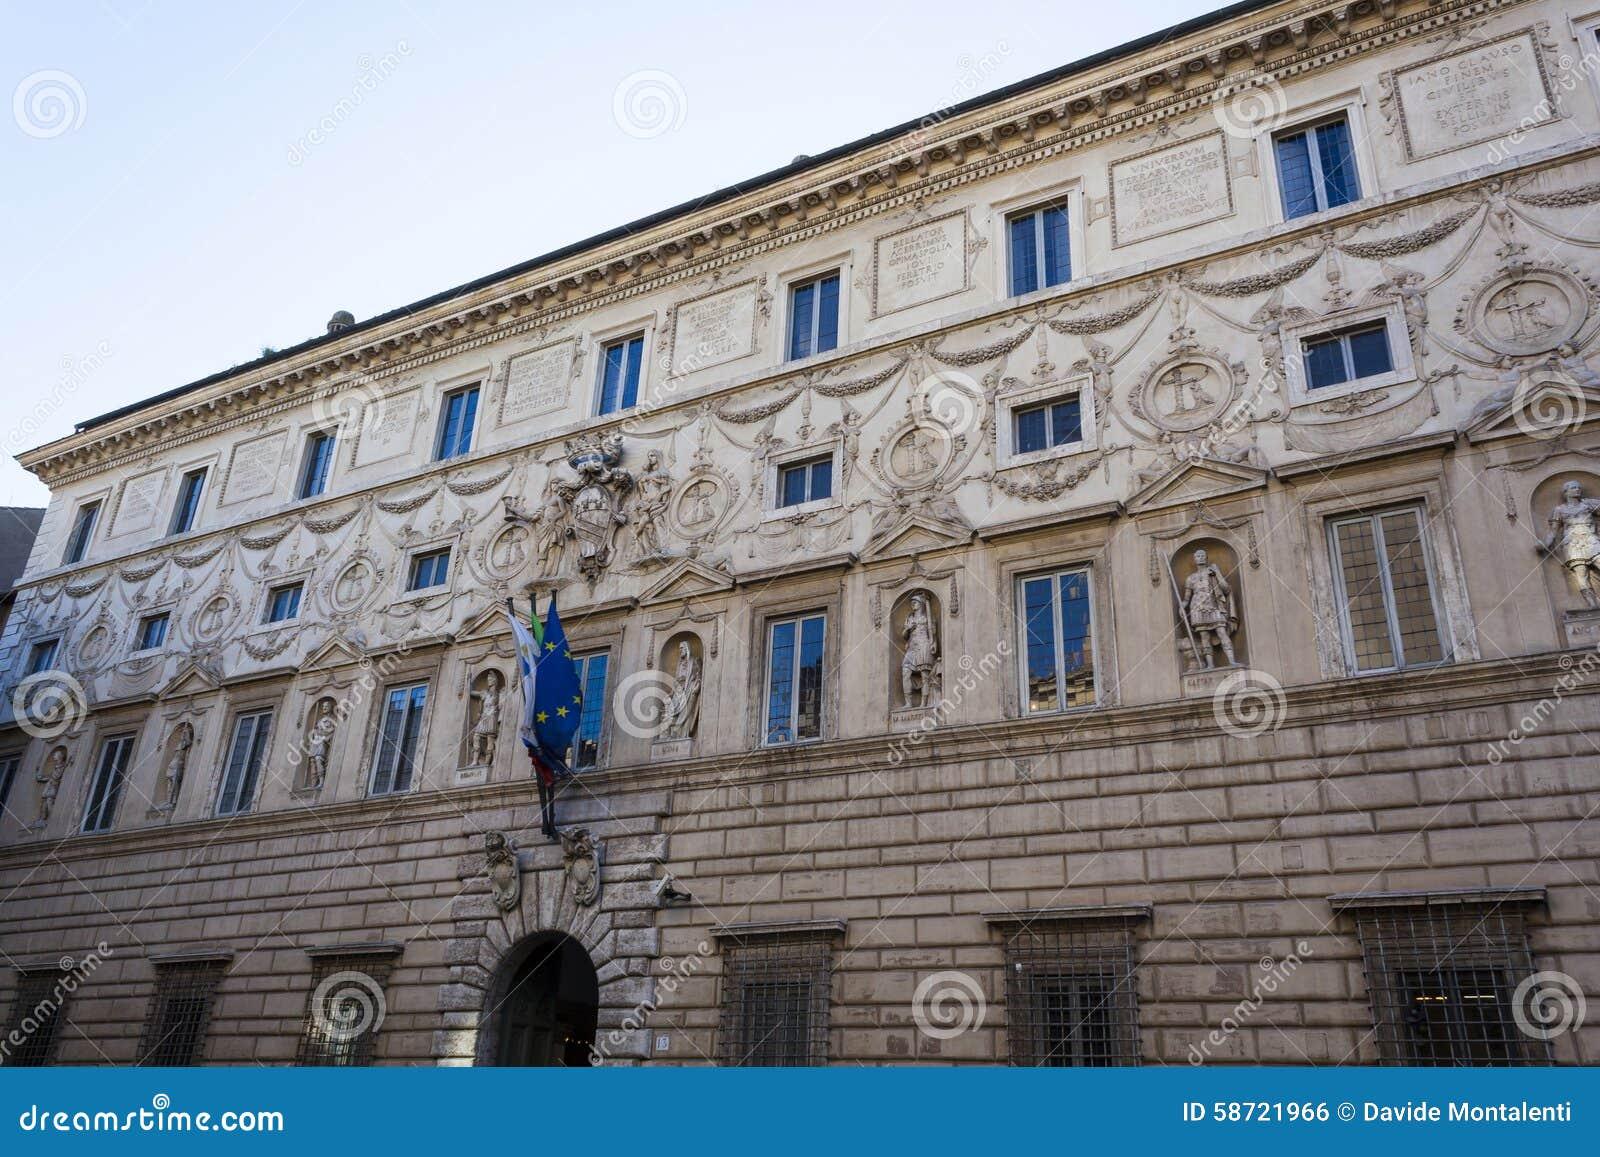 Palazzo spada rome stock photo image 58721966 for Stucco facade